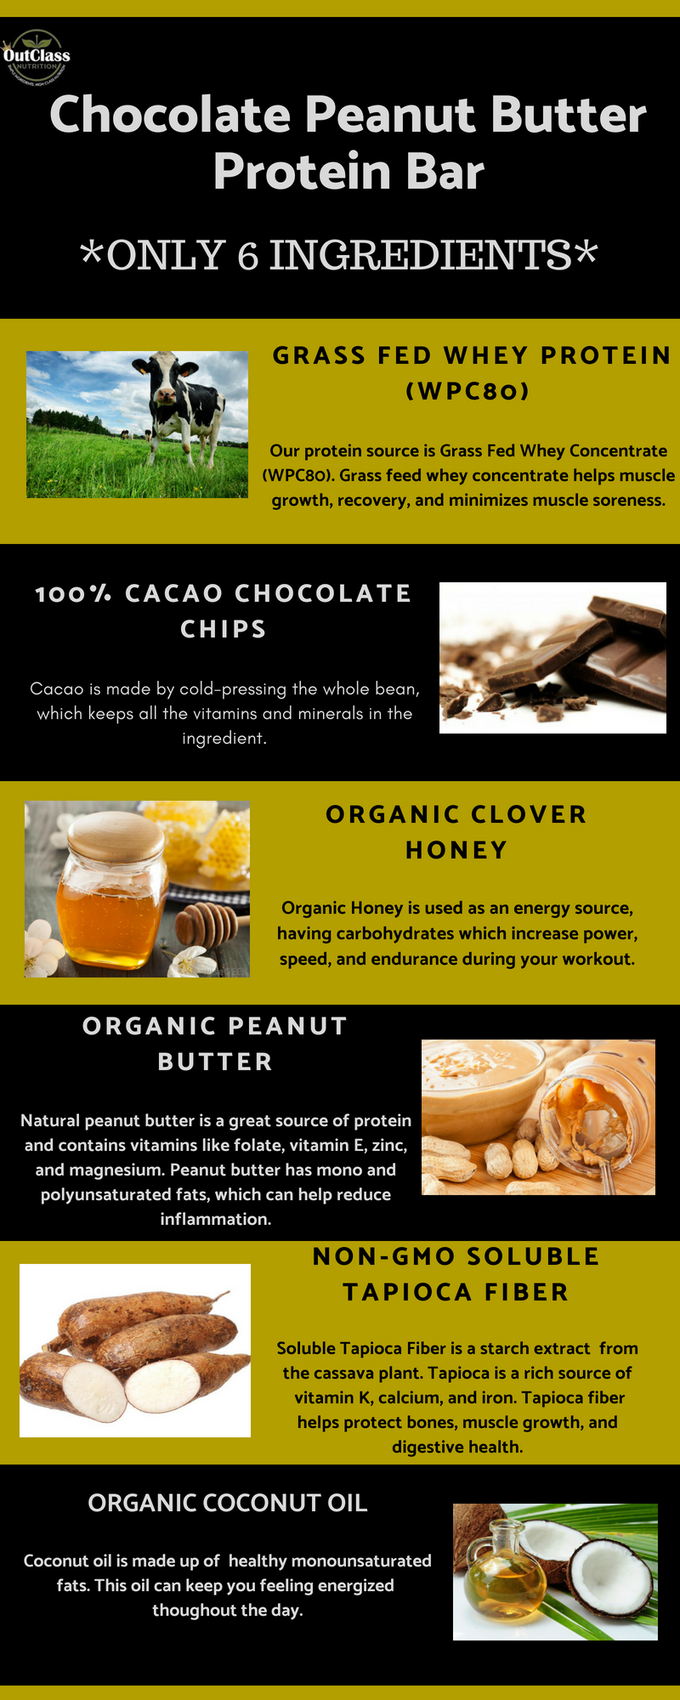 Chocolate Peanut Butter Bar Ingredients